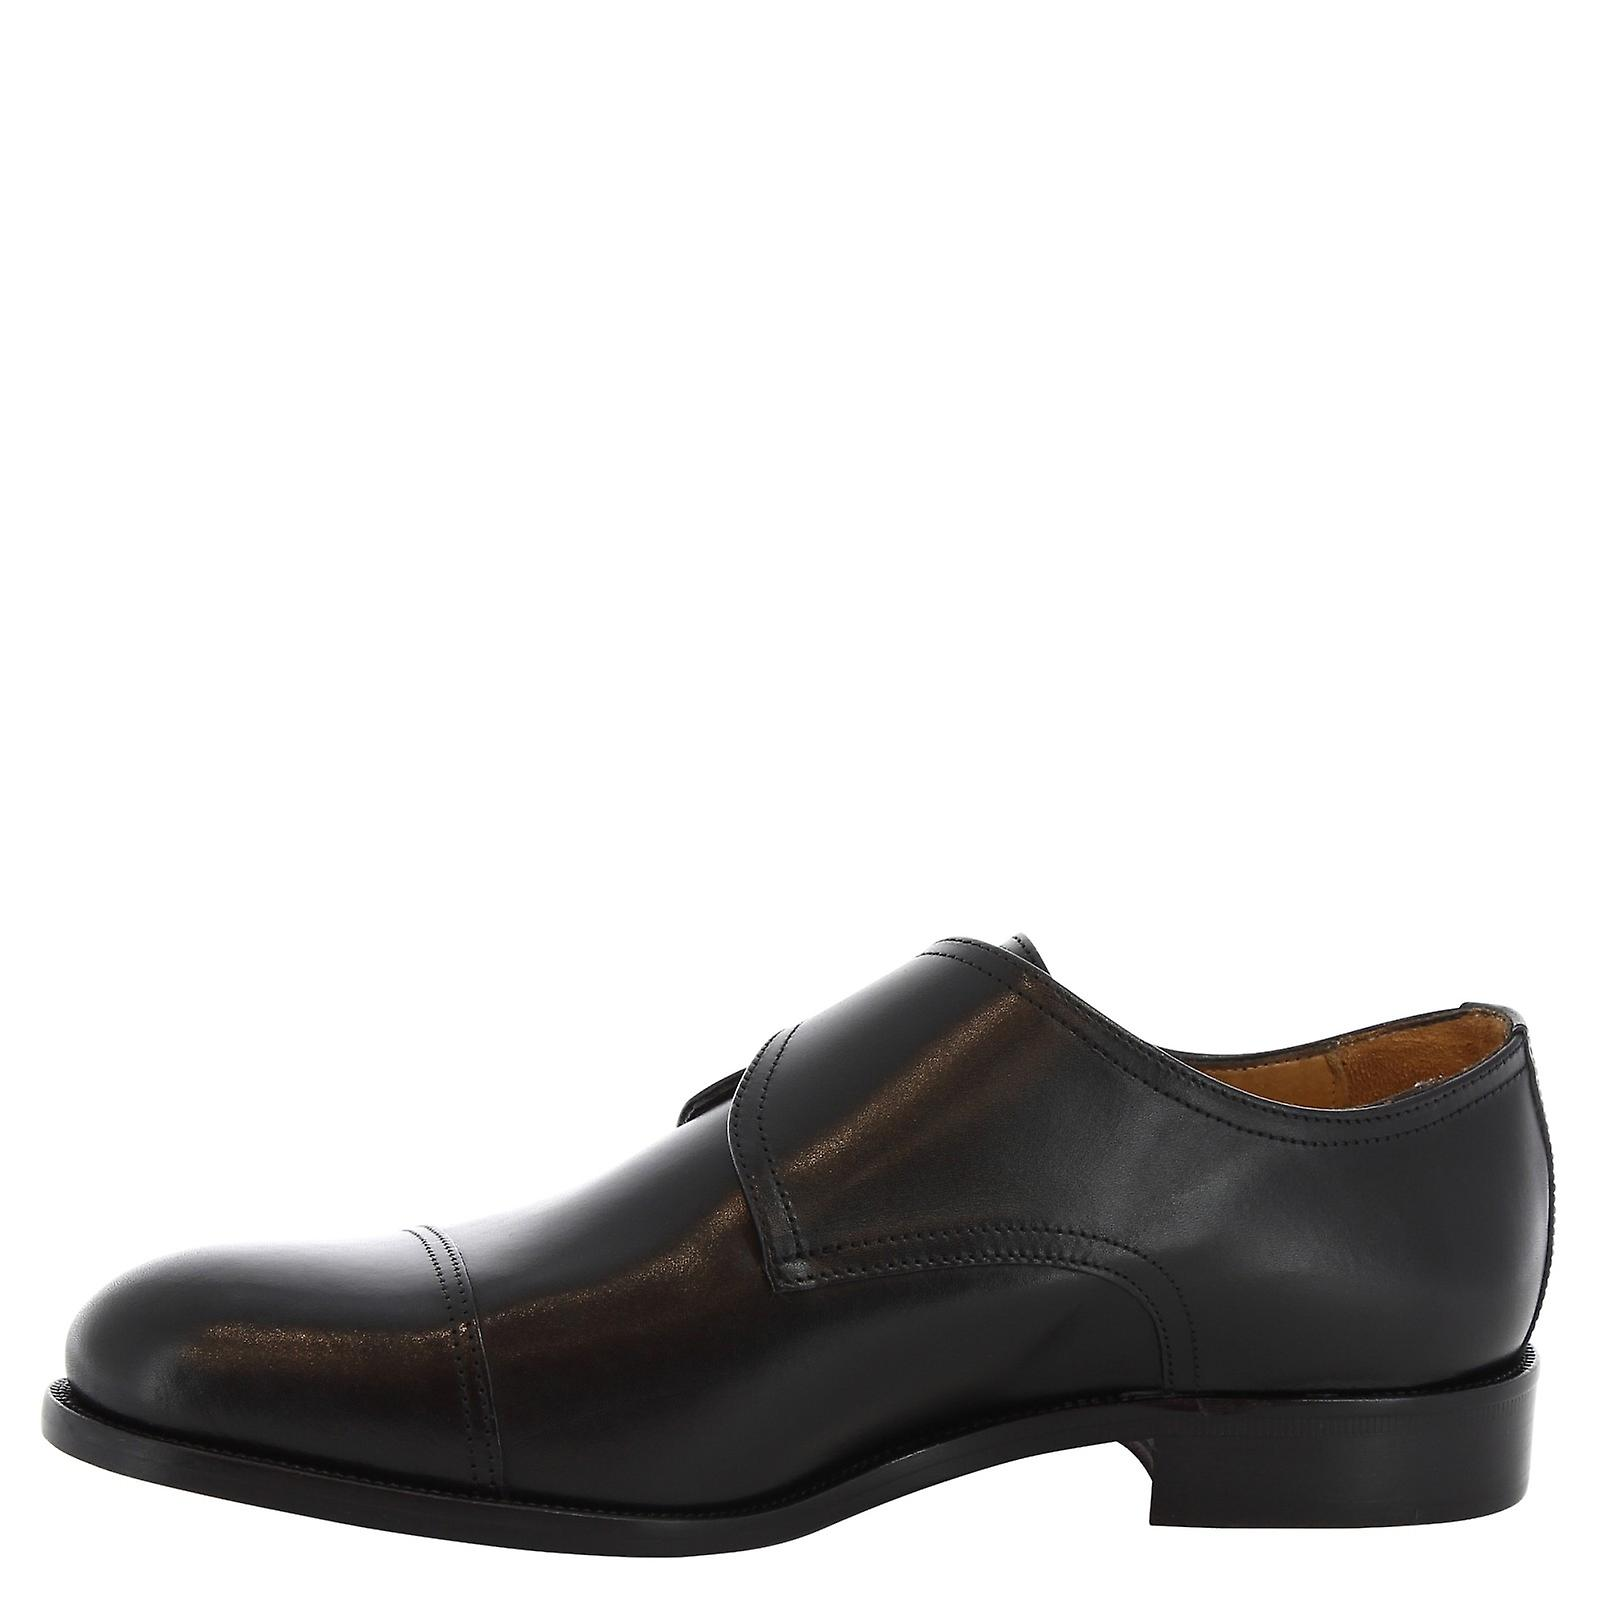 Leonardo Shoes Man's Handmade Monk In Black Leather